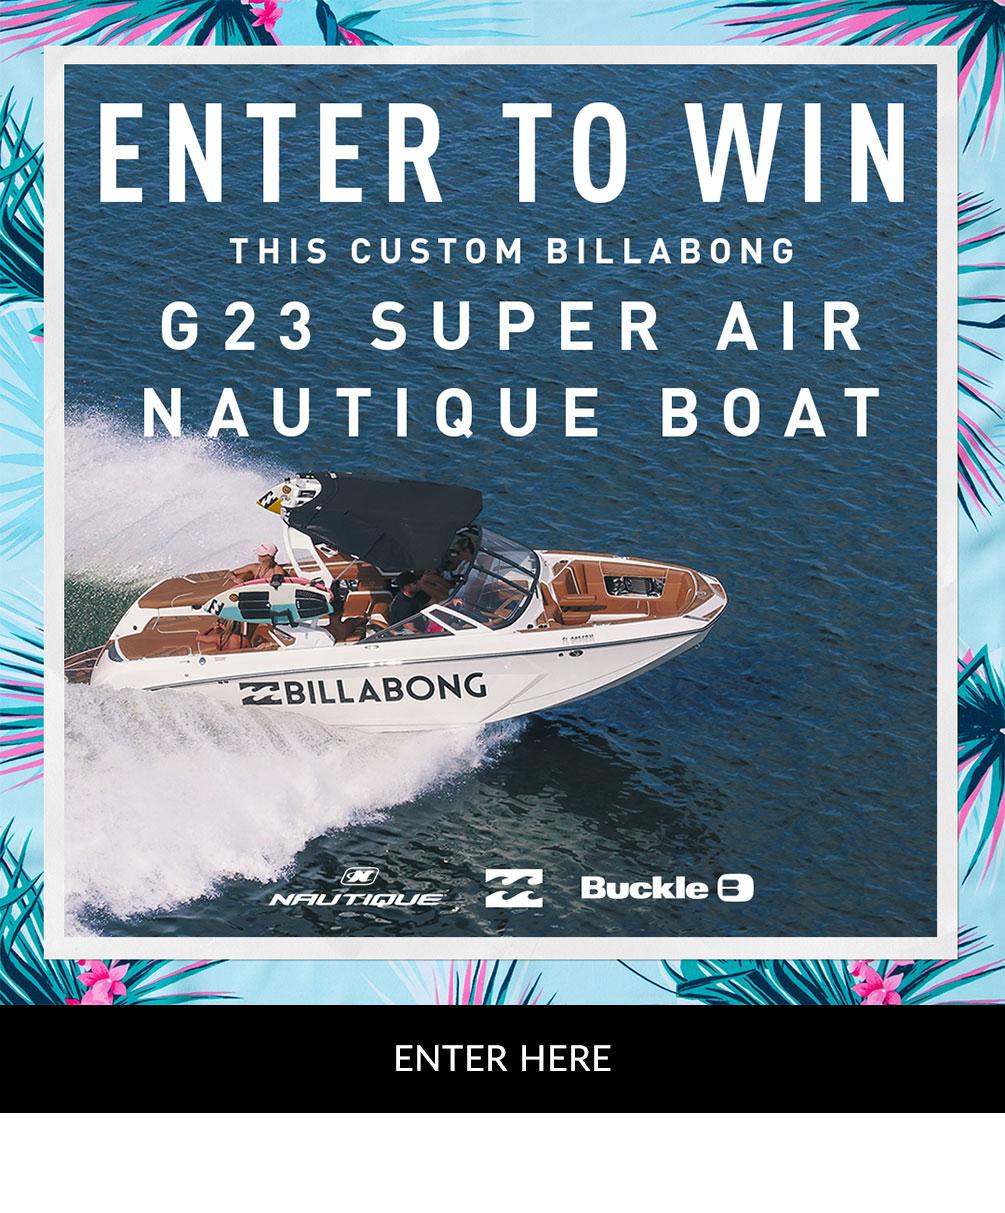 f5b2d6d1db46 Enter to win this custom Billabong G23 Super Air Nautique Boat